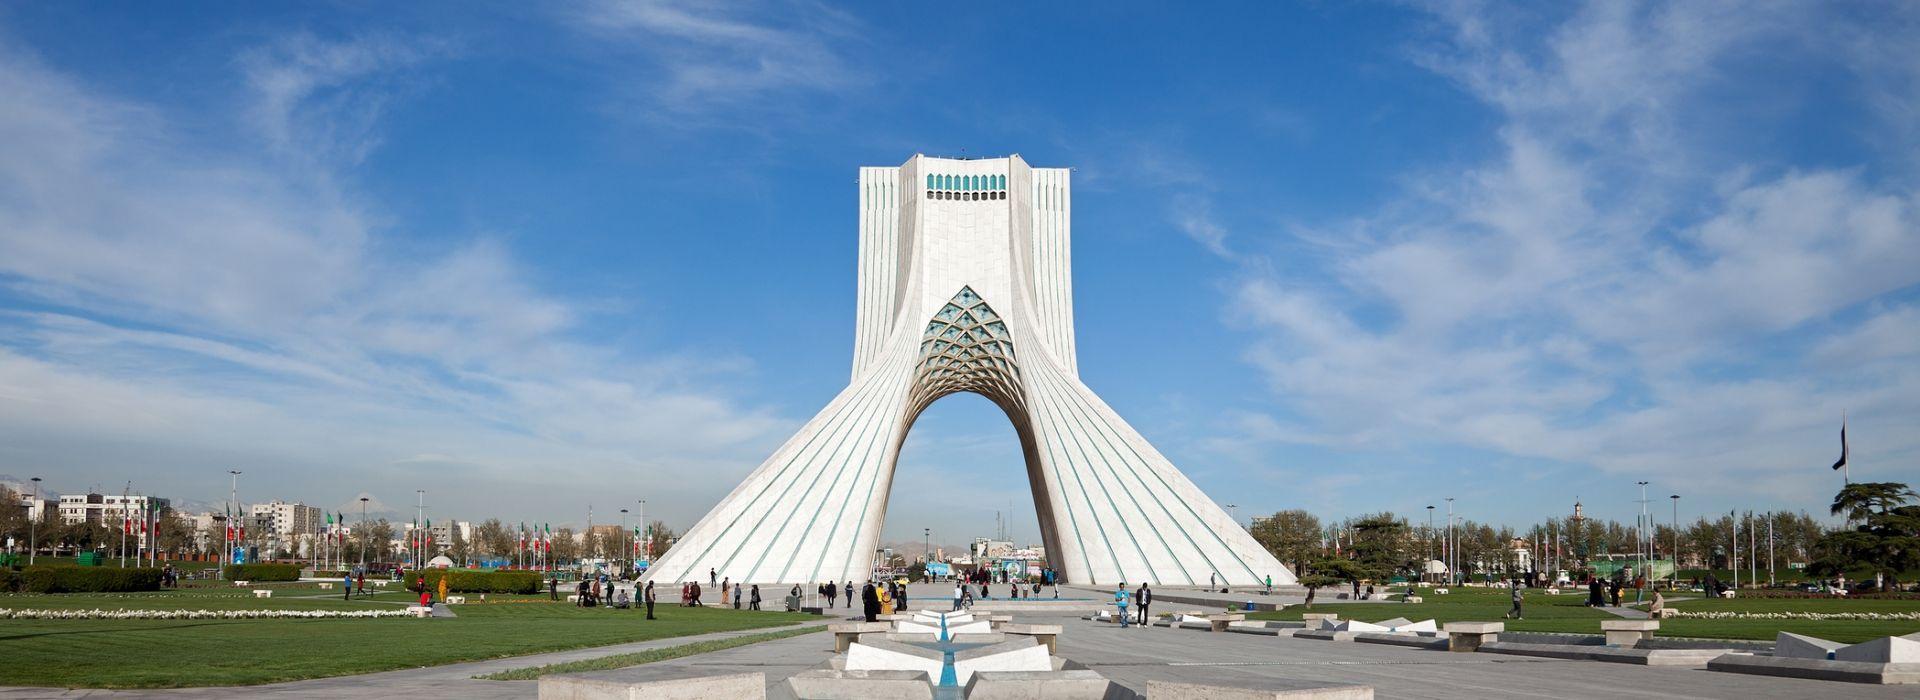 Adventure and sport activities Tours in Iran